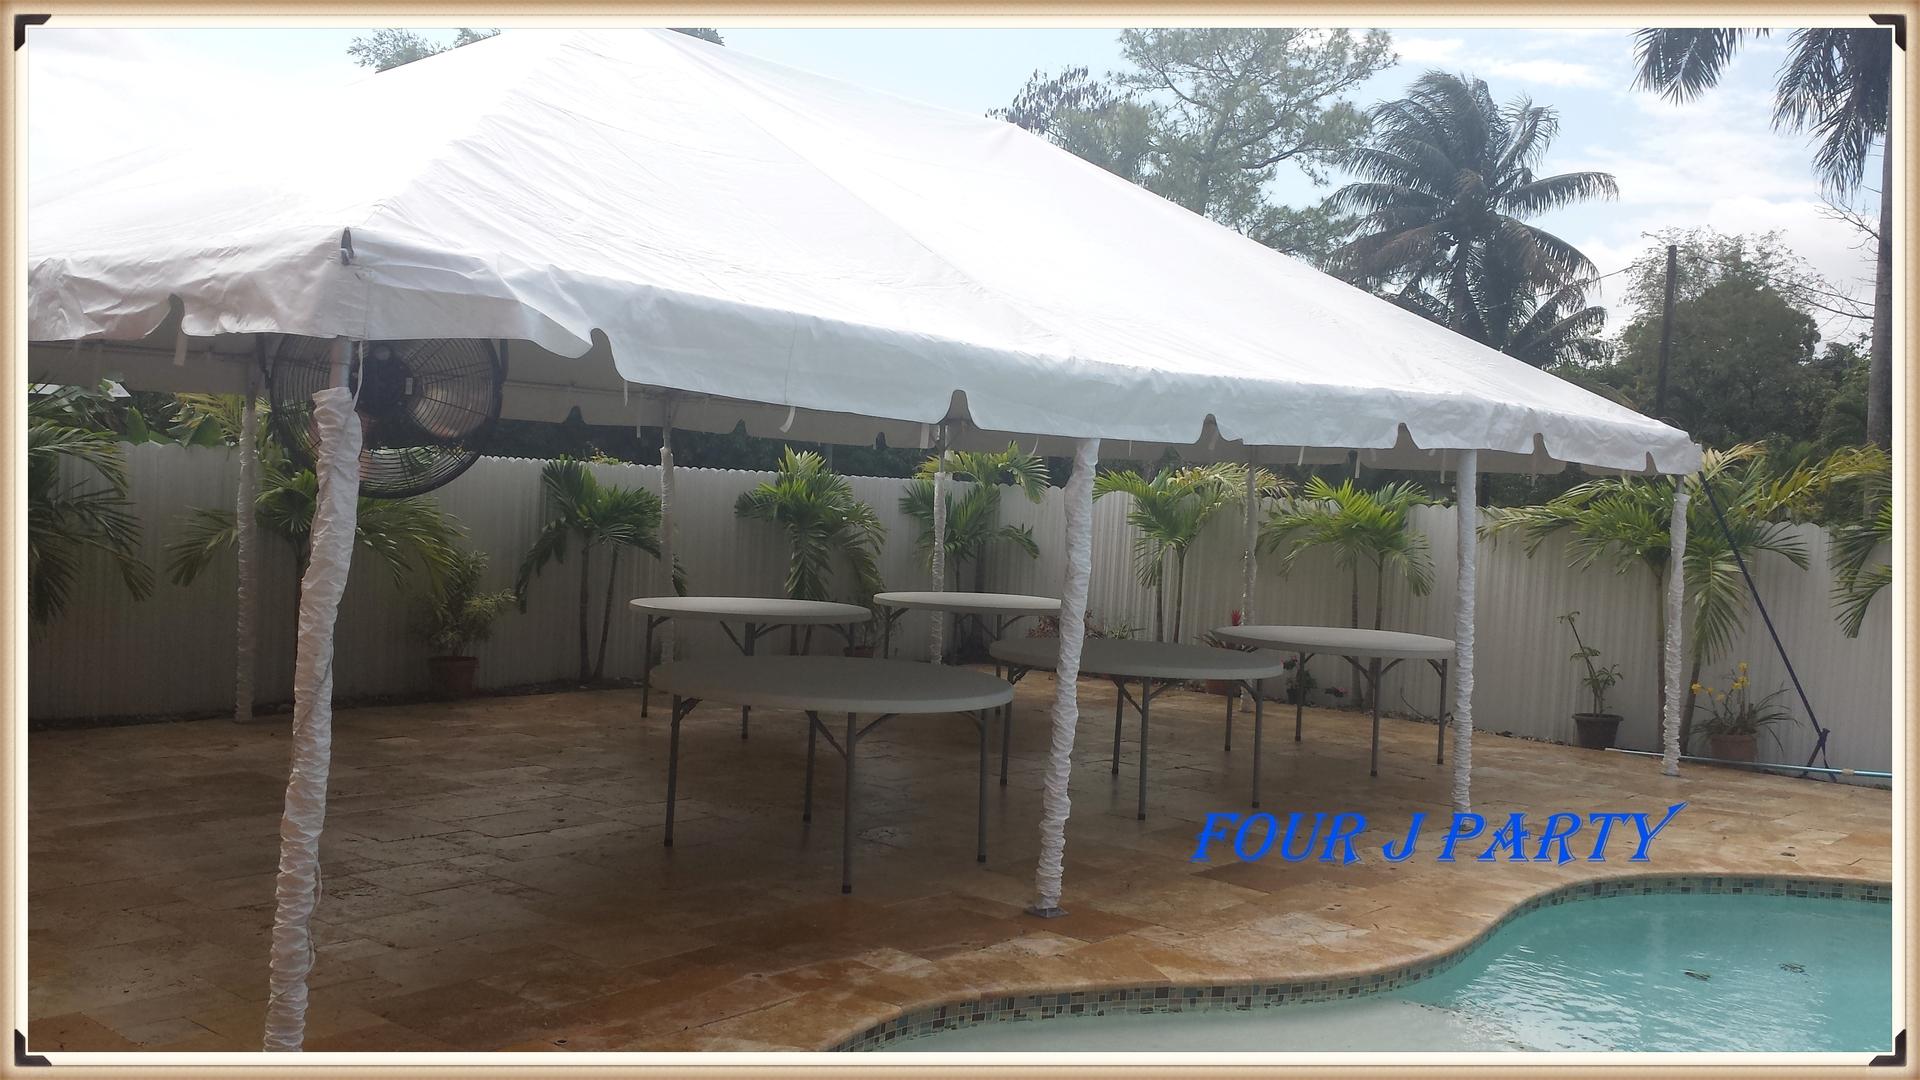 Corporation Tent 20 x 40 Rent